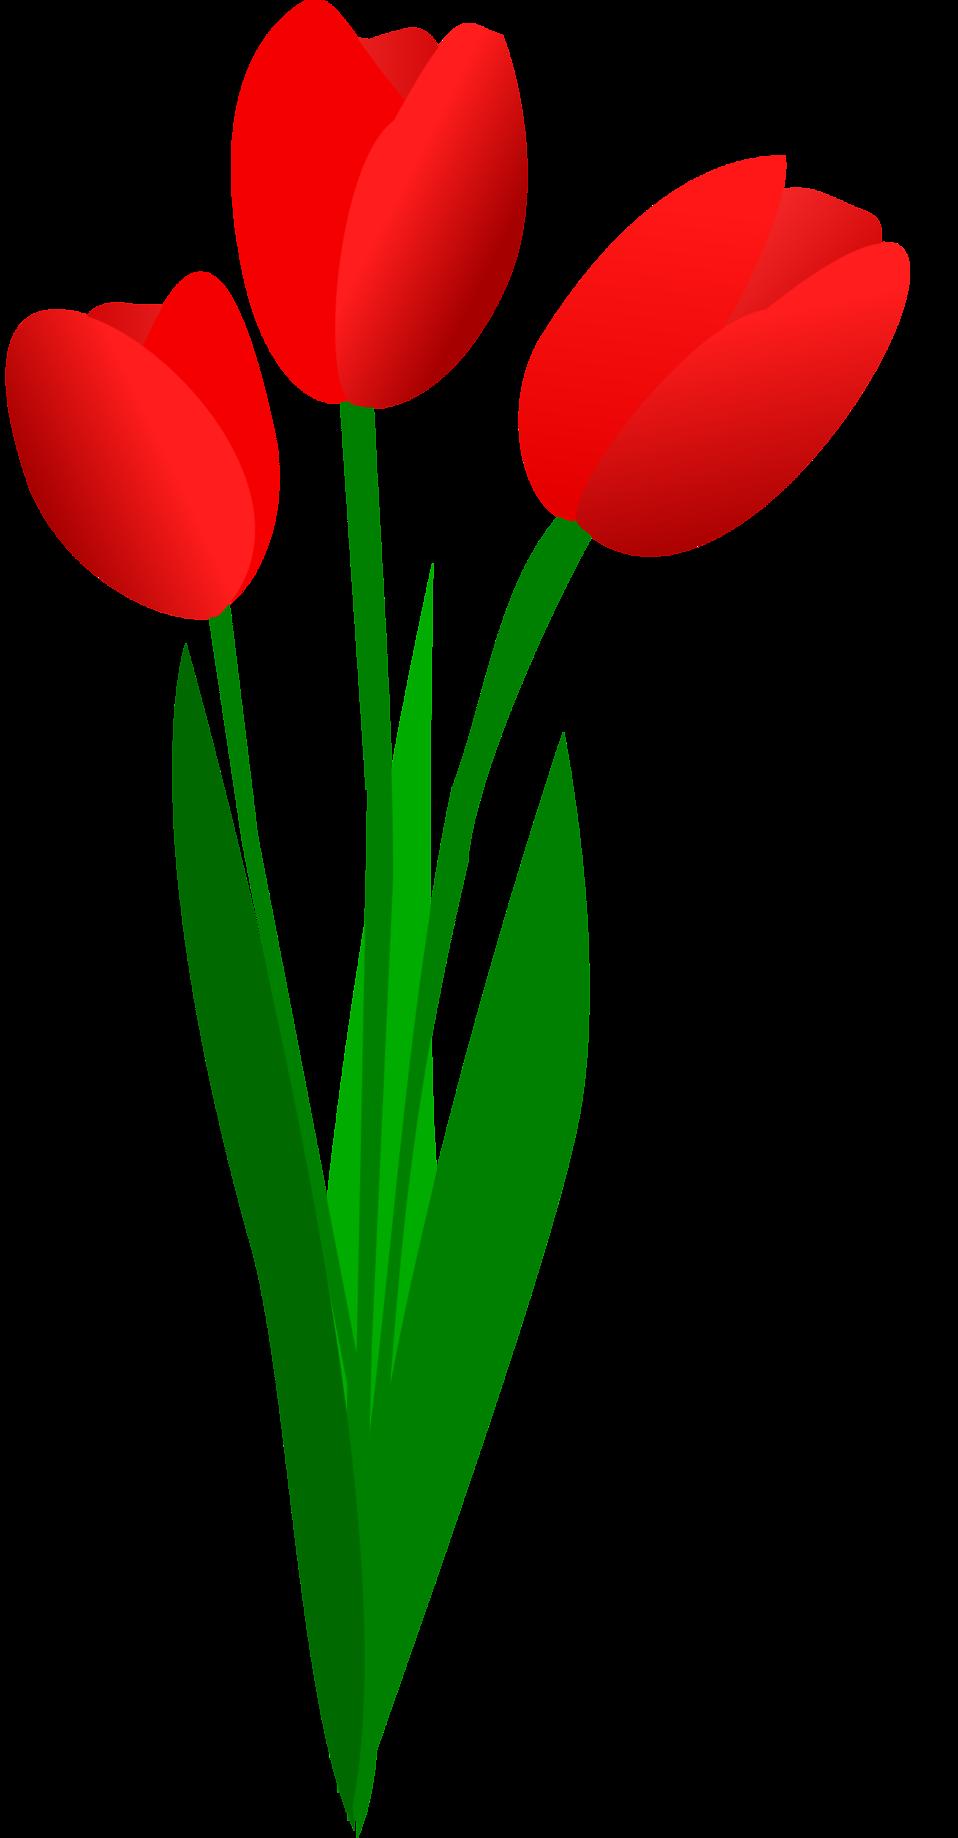 958x1838 Daffodil Clipart Narcissus Flower